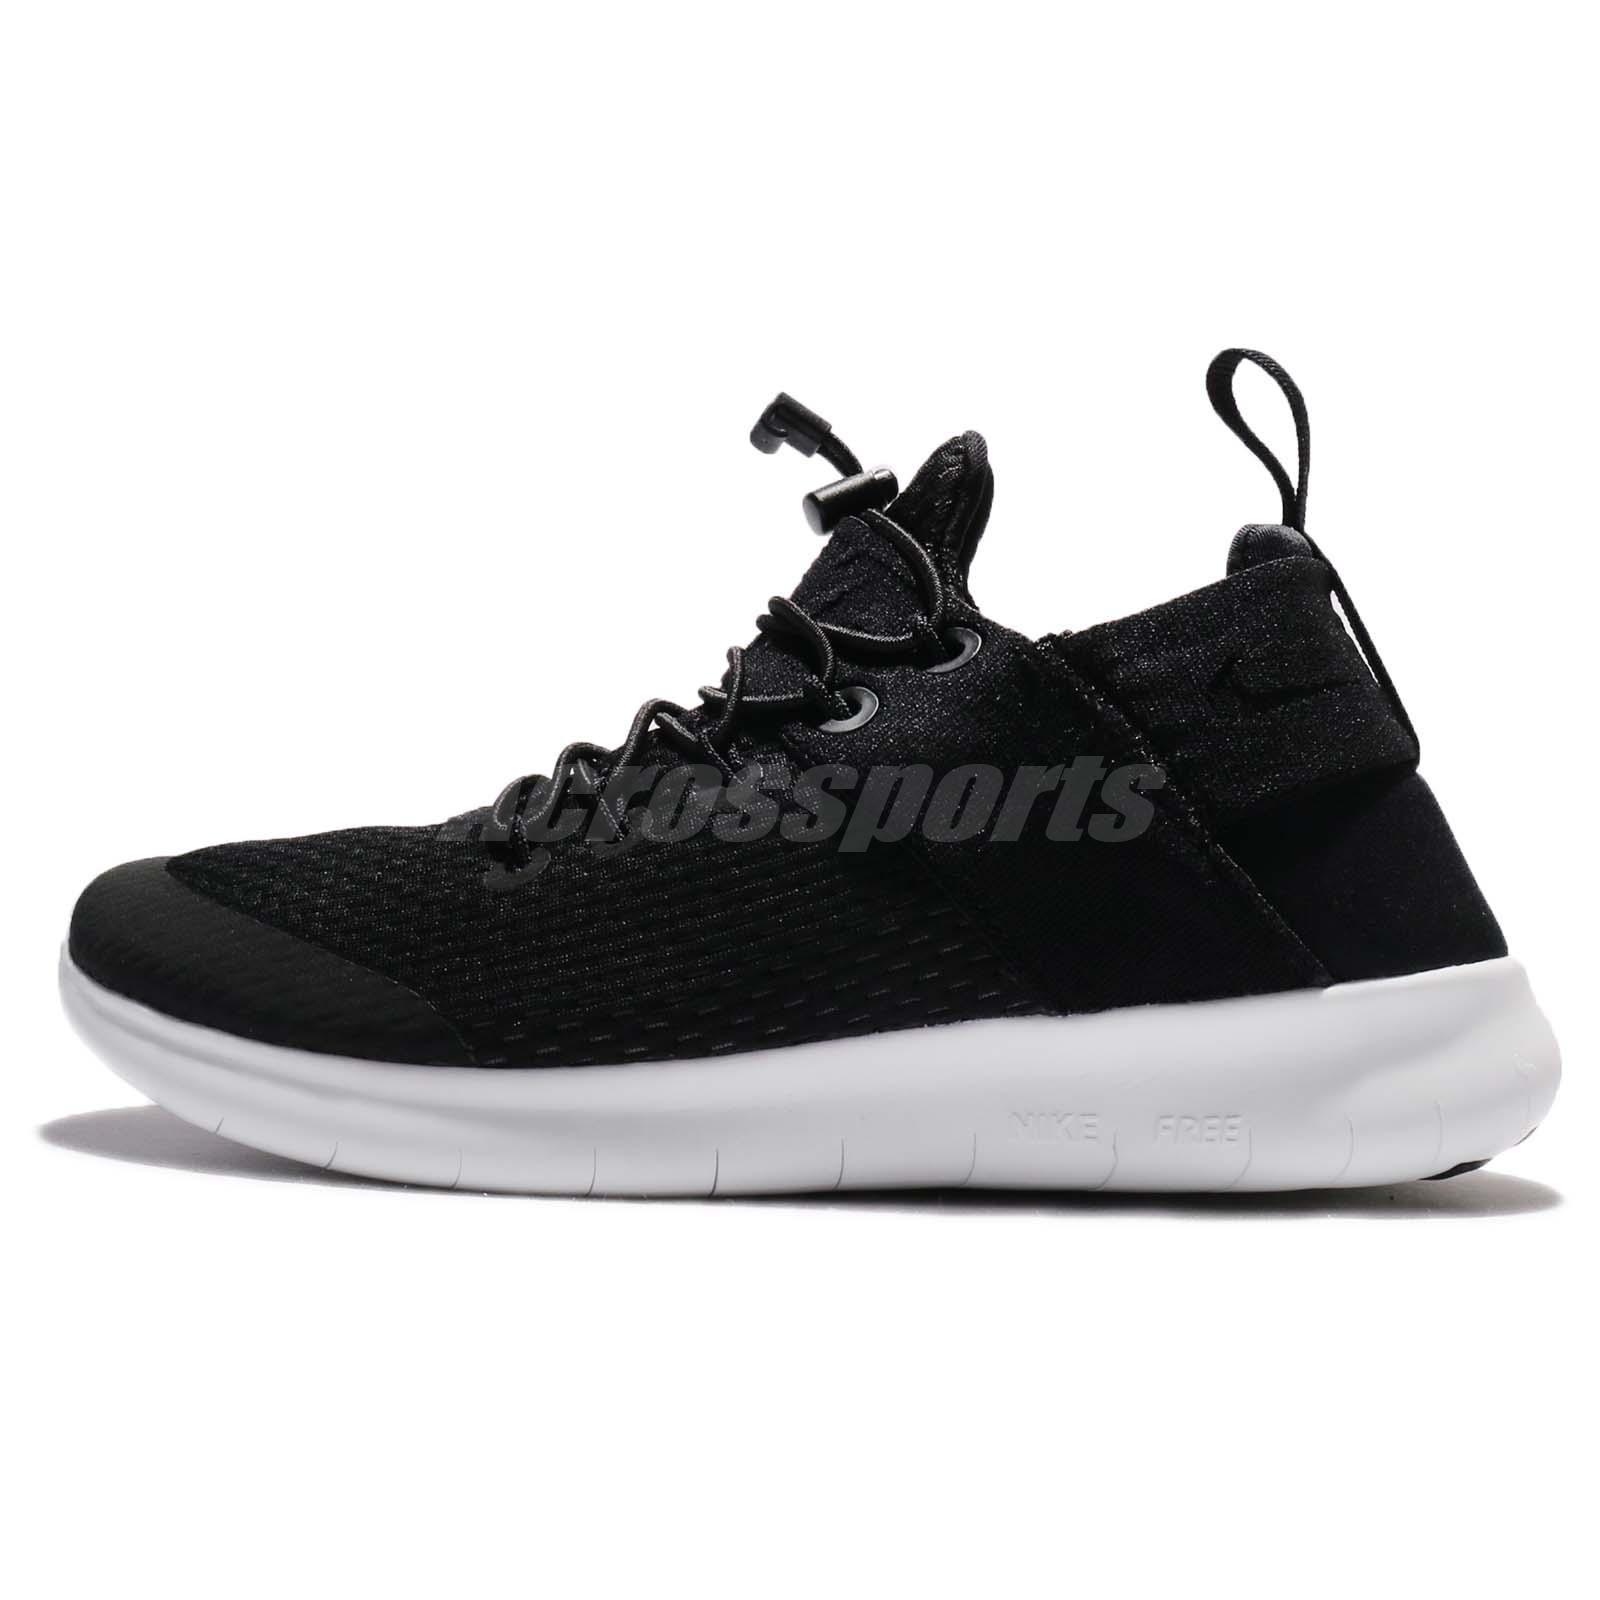 NIKE Womens Nike Free Rn Running Cmtr 2017 880842-003 BLACK Size 9.5